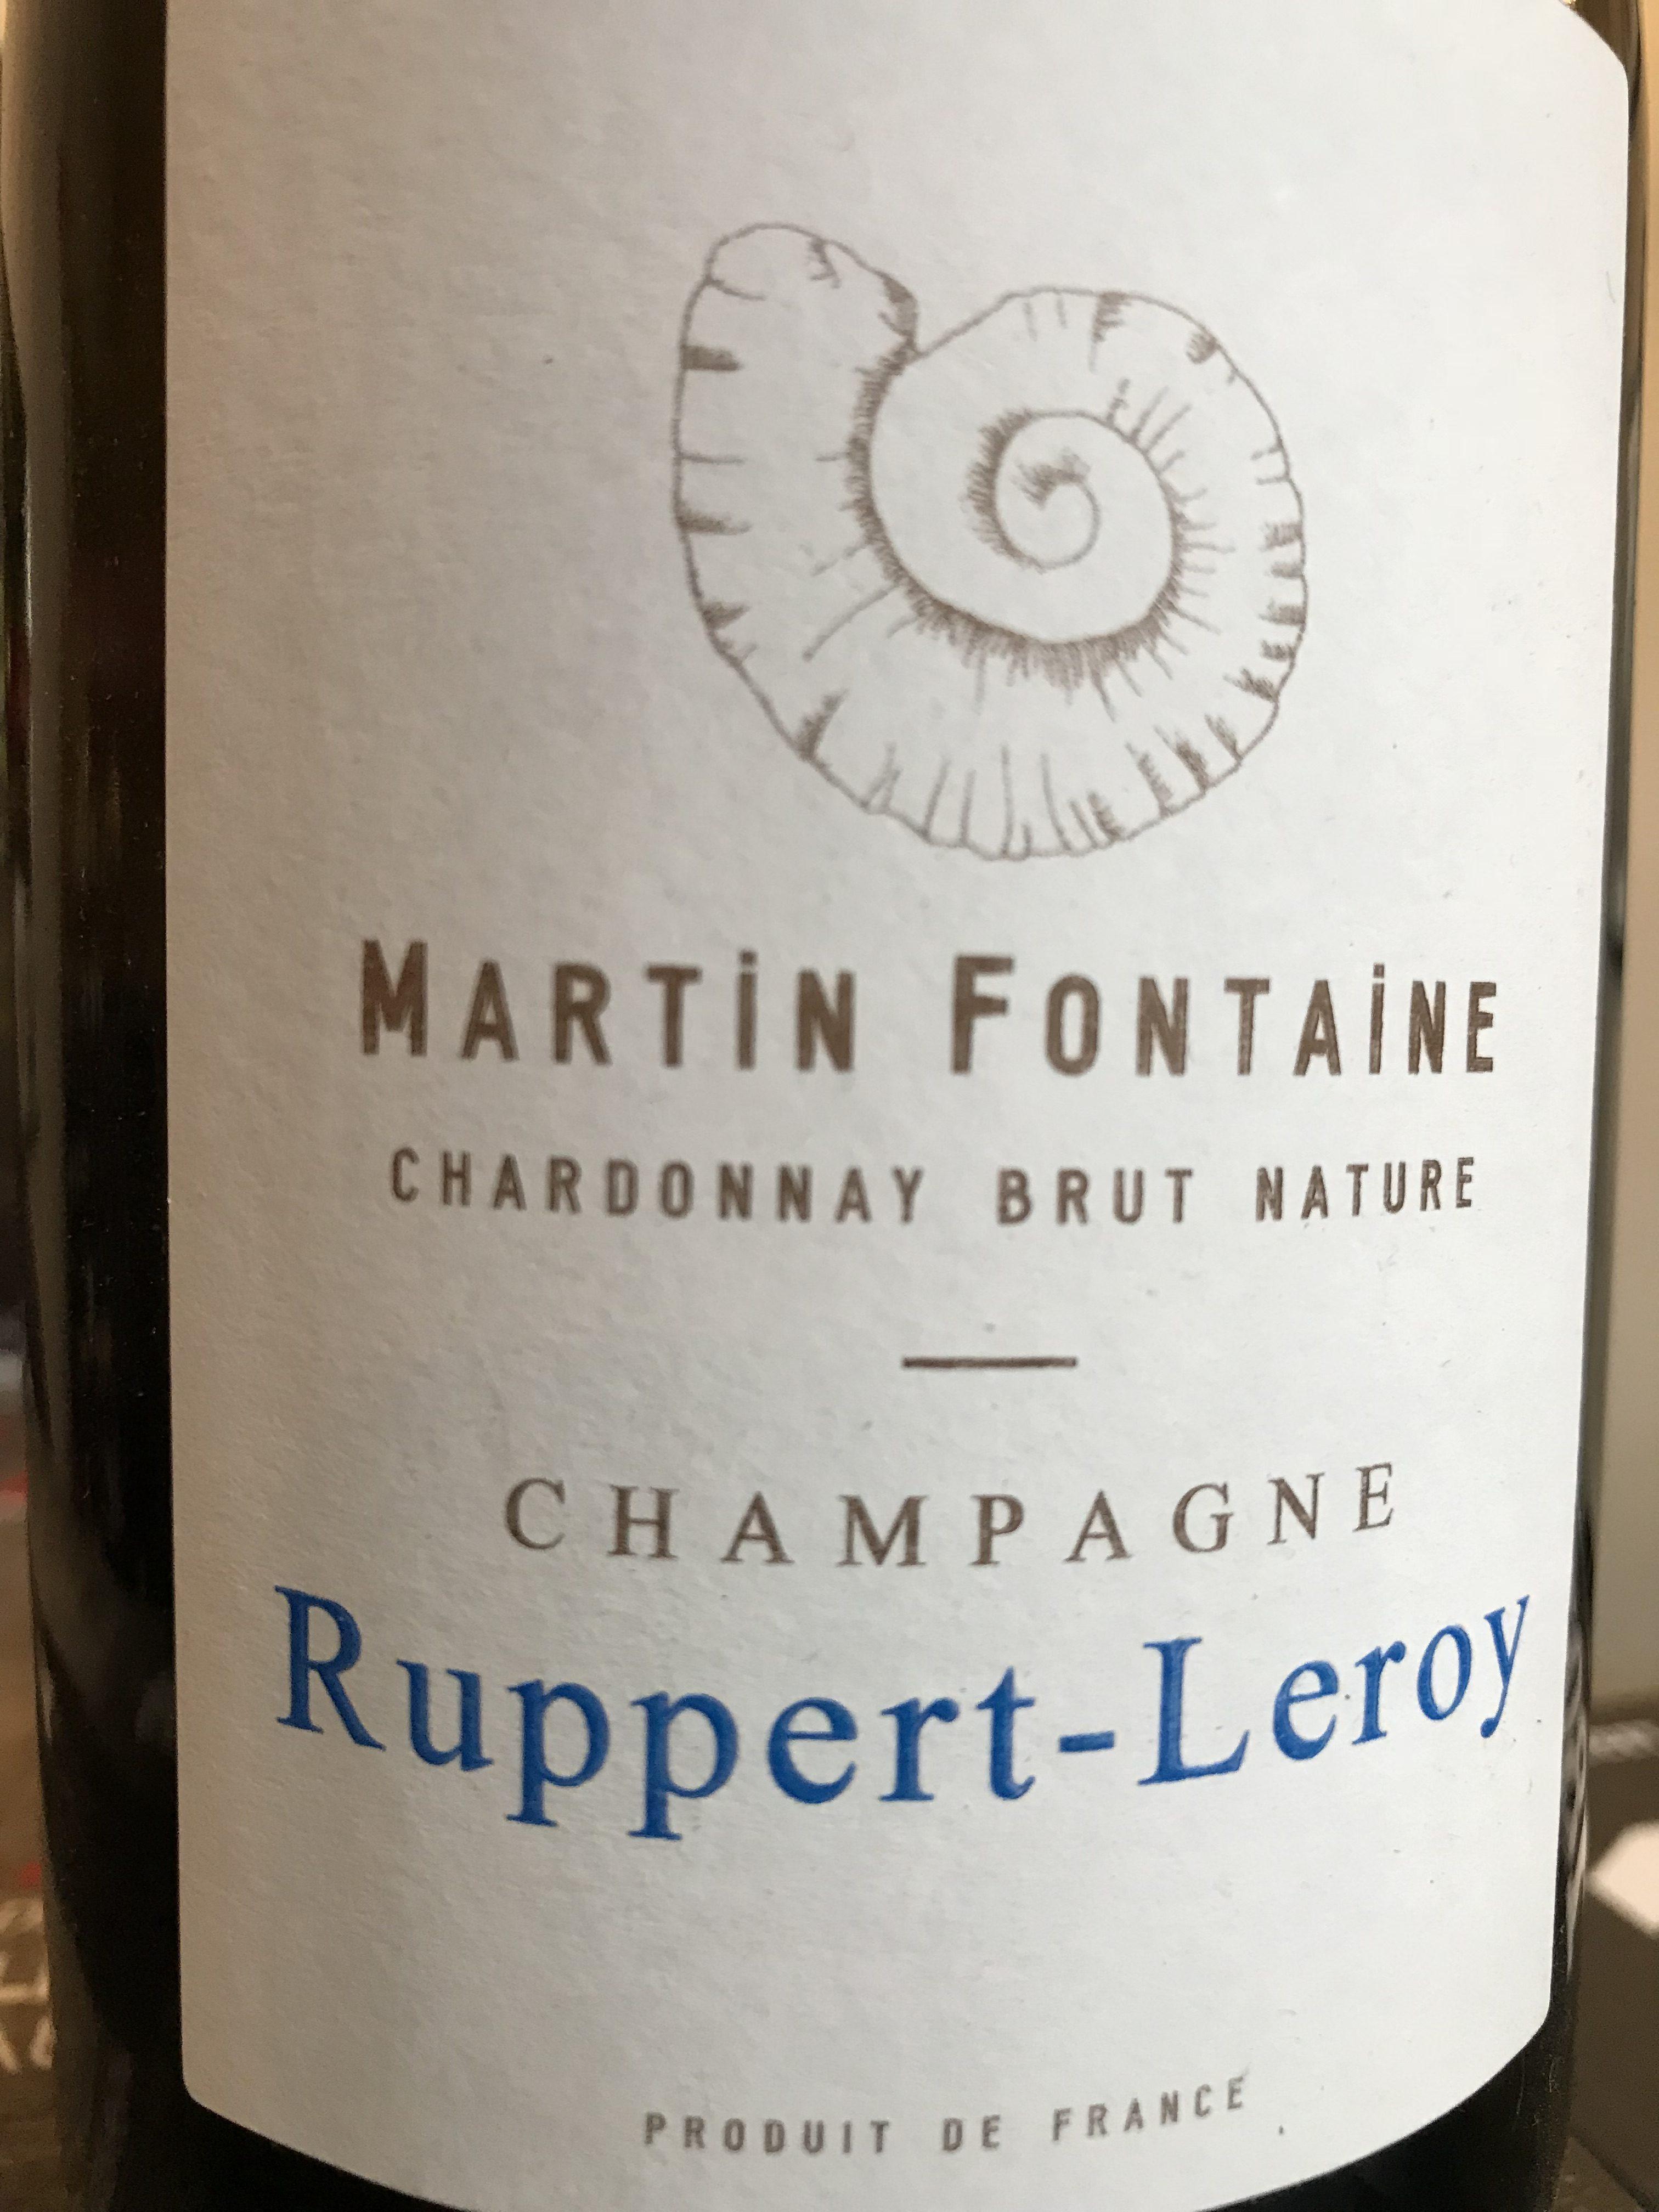 MARTIN FONTAINE - 100% Chardonnay